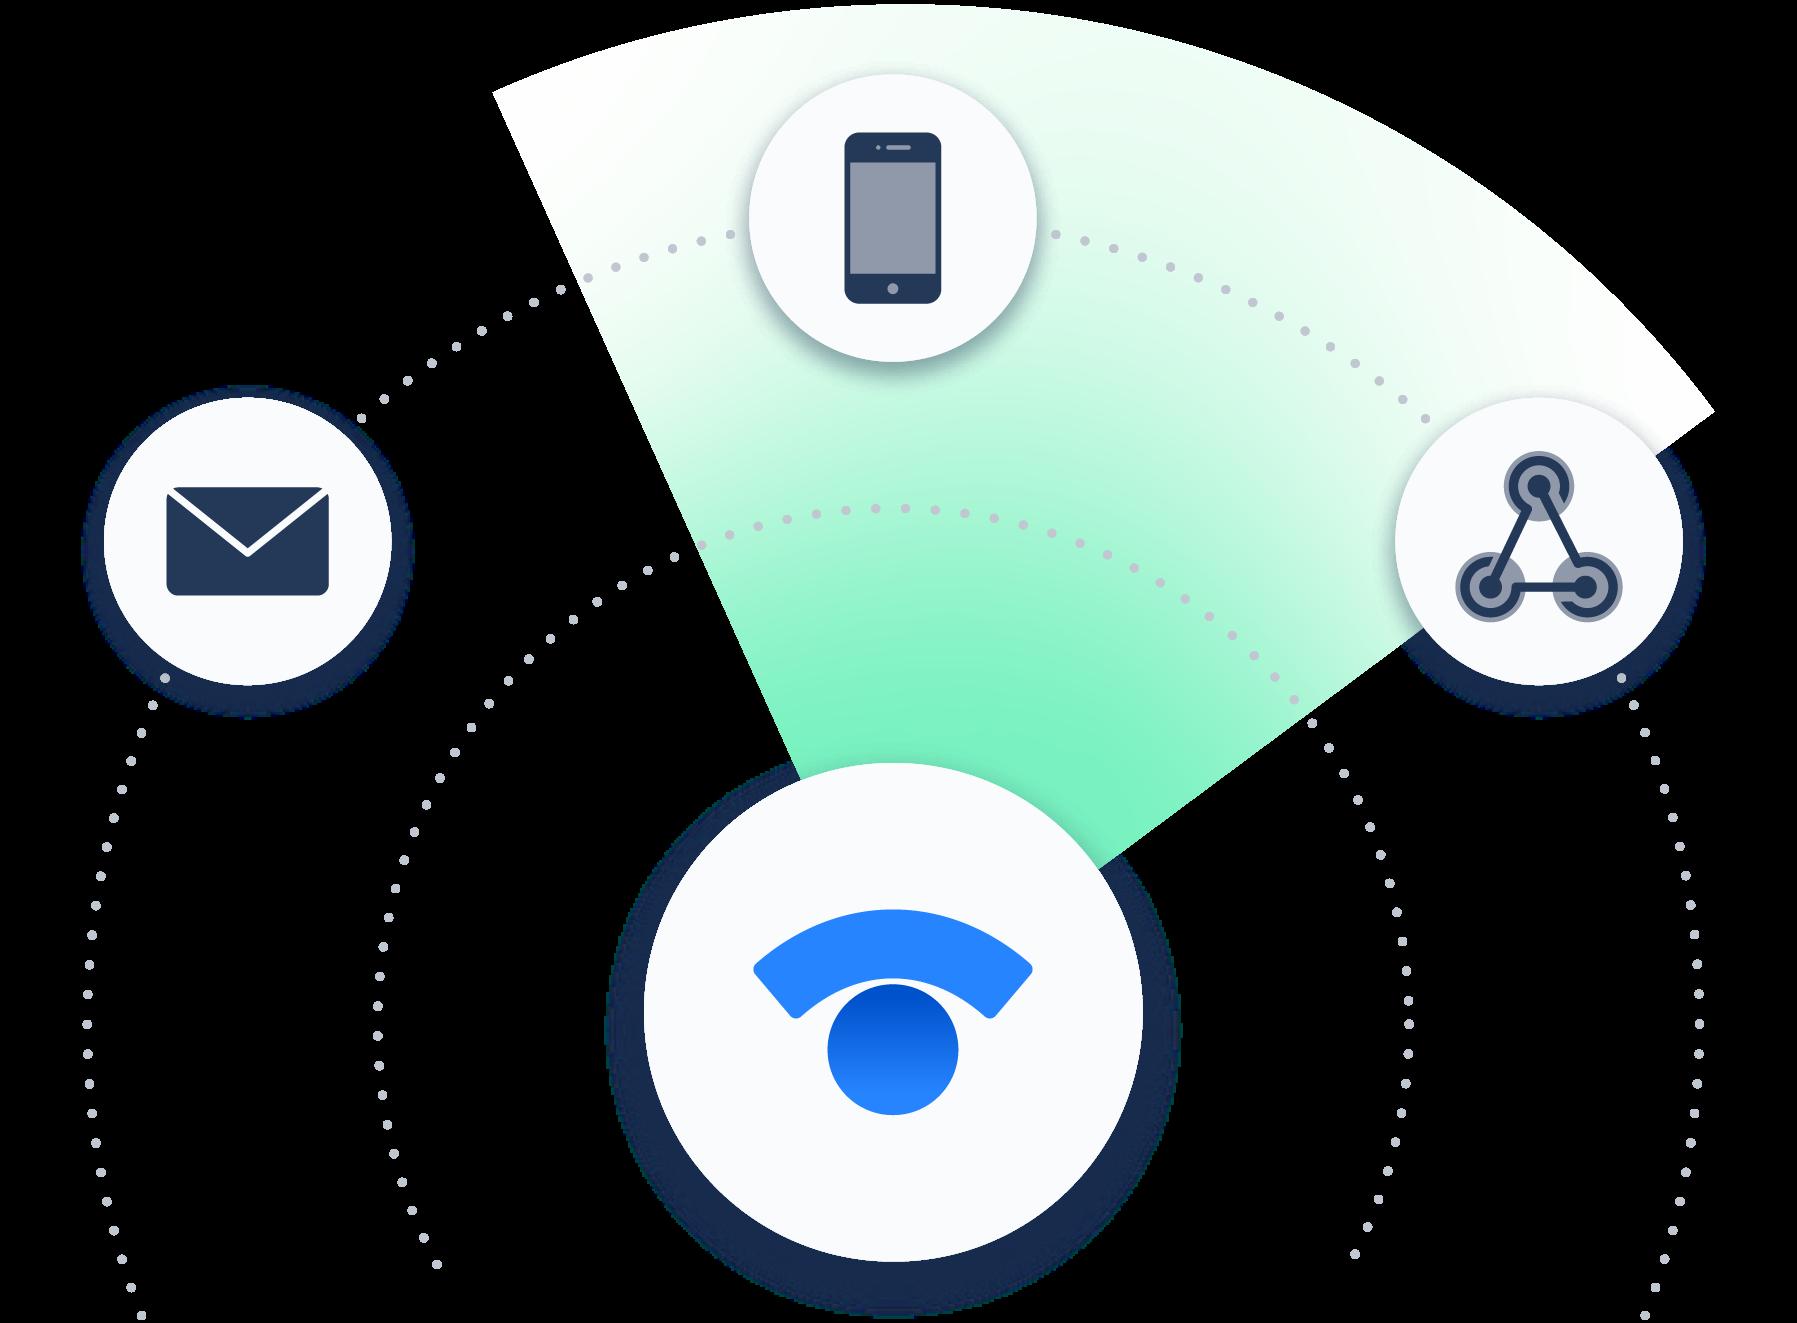 Statuspage 아이콘 및 주변 커뮤니케이션 아이콘(이메일, 휴대폰 등)